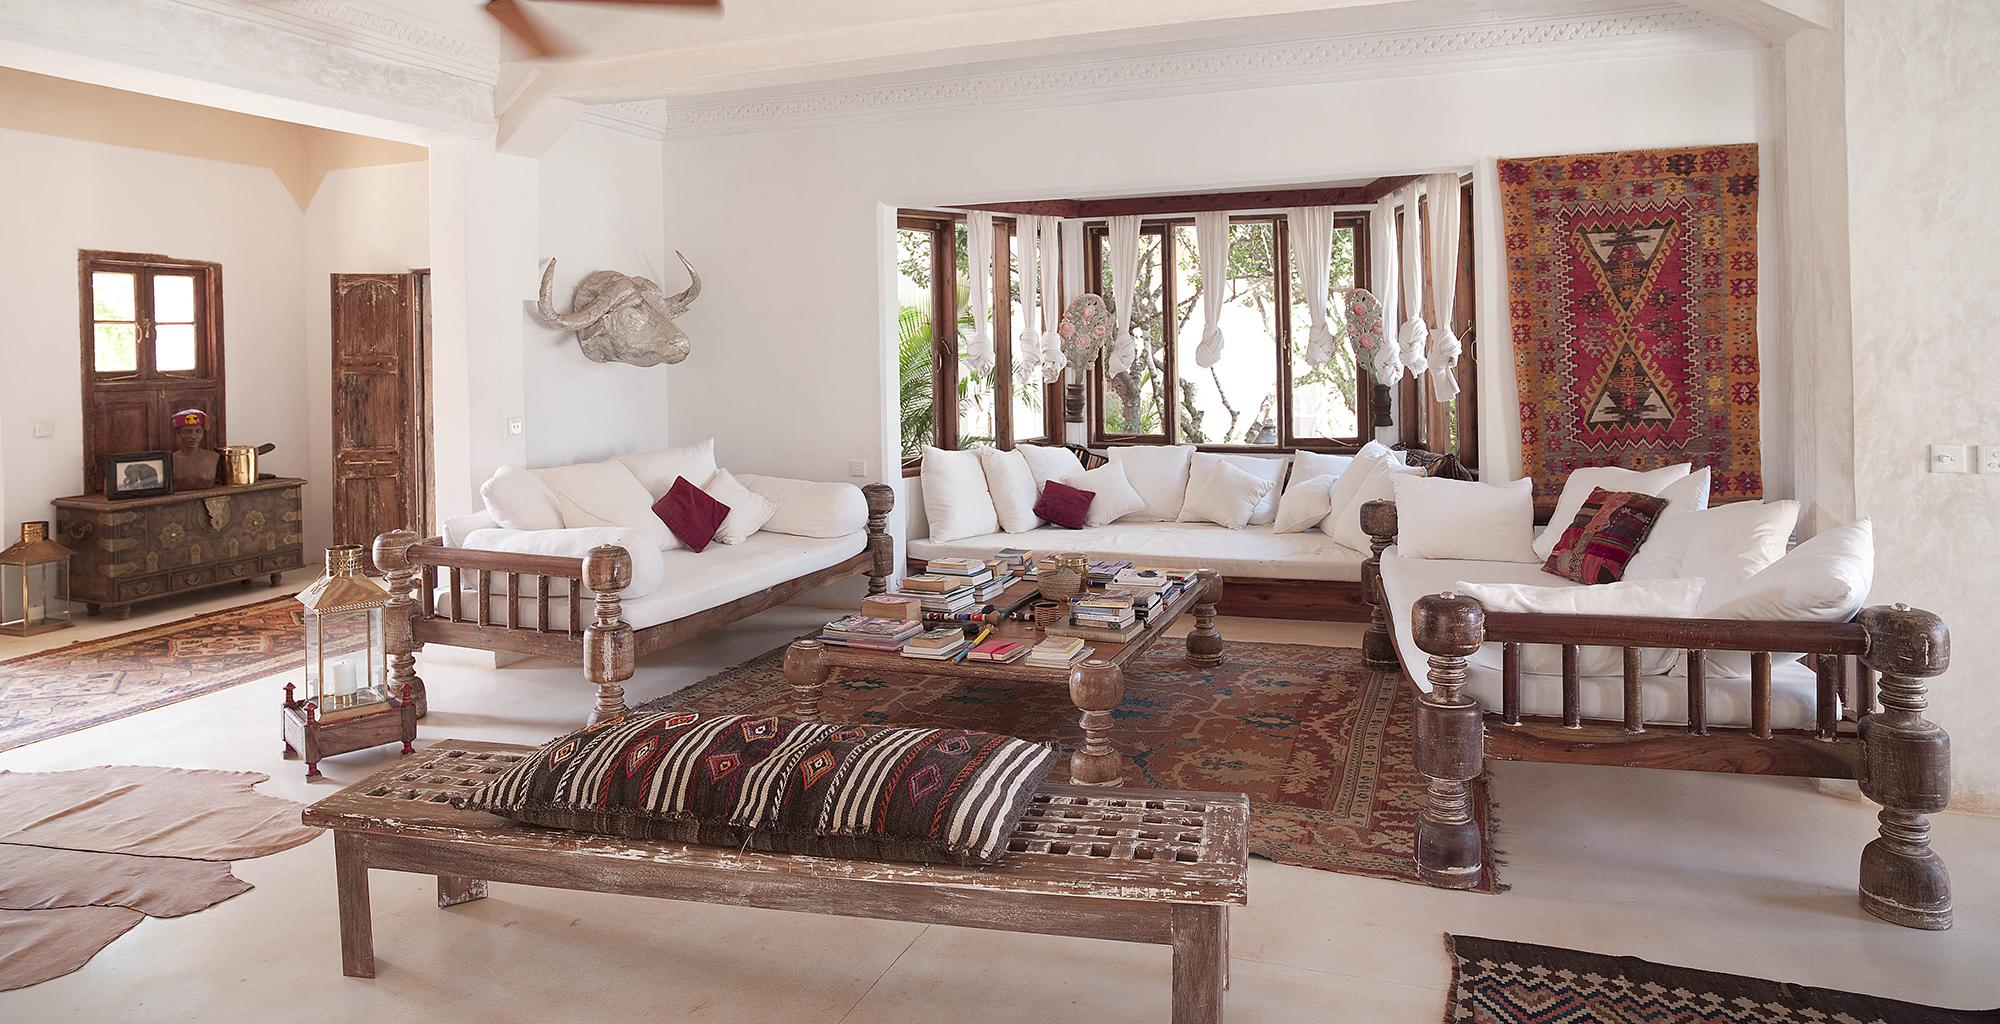 Kenya-The-Majlis-Lounge